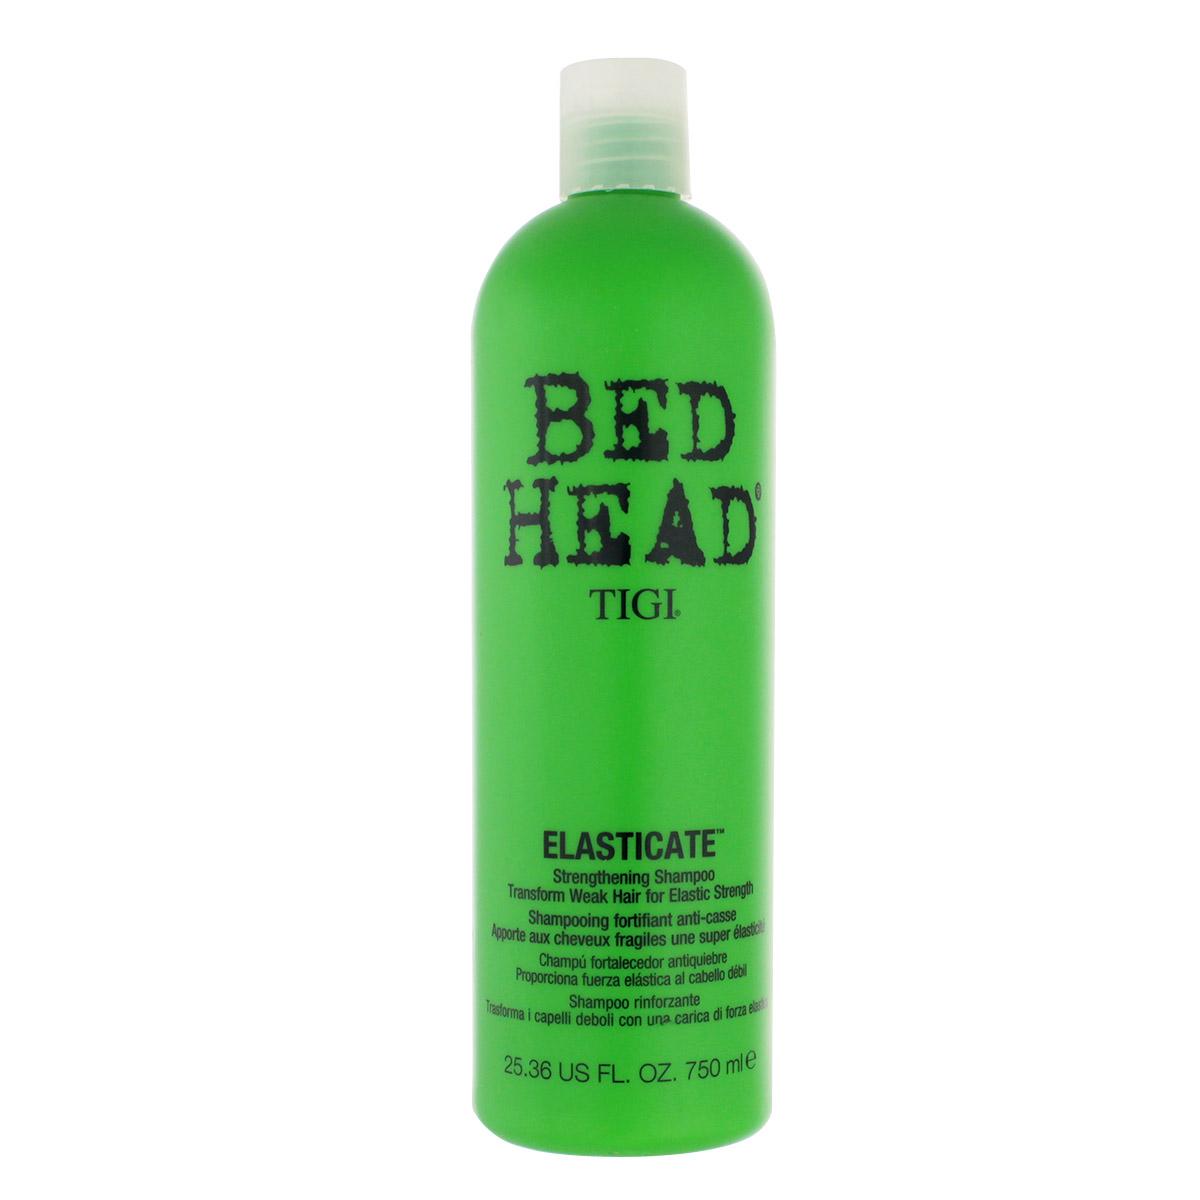 Tigi Bed Head Elasticate Strengthening Shampoo 750 ml